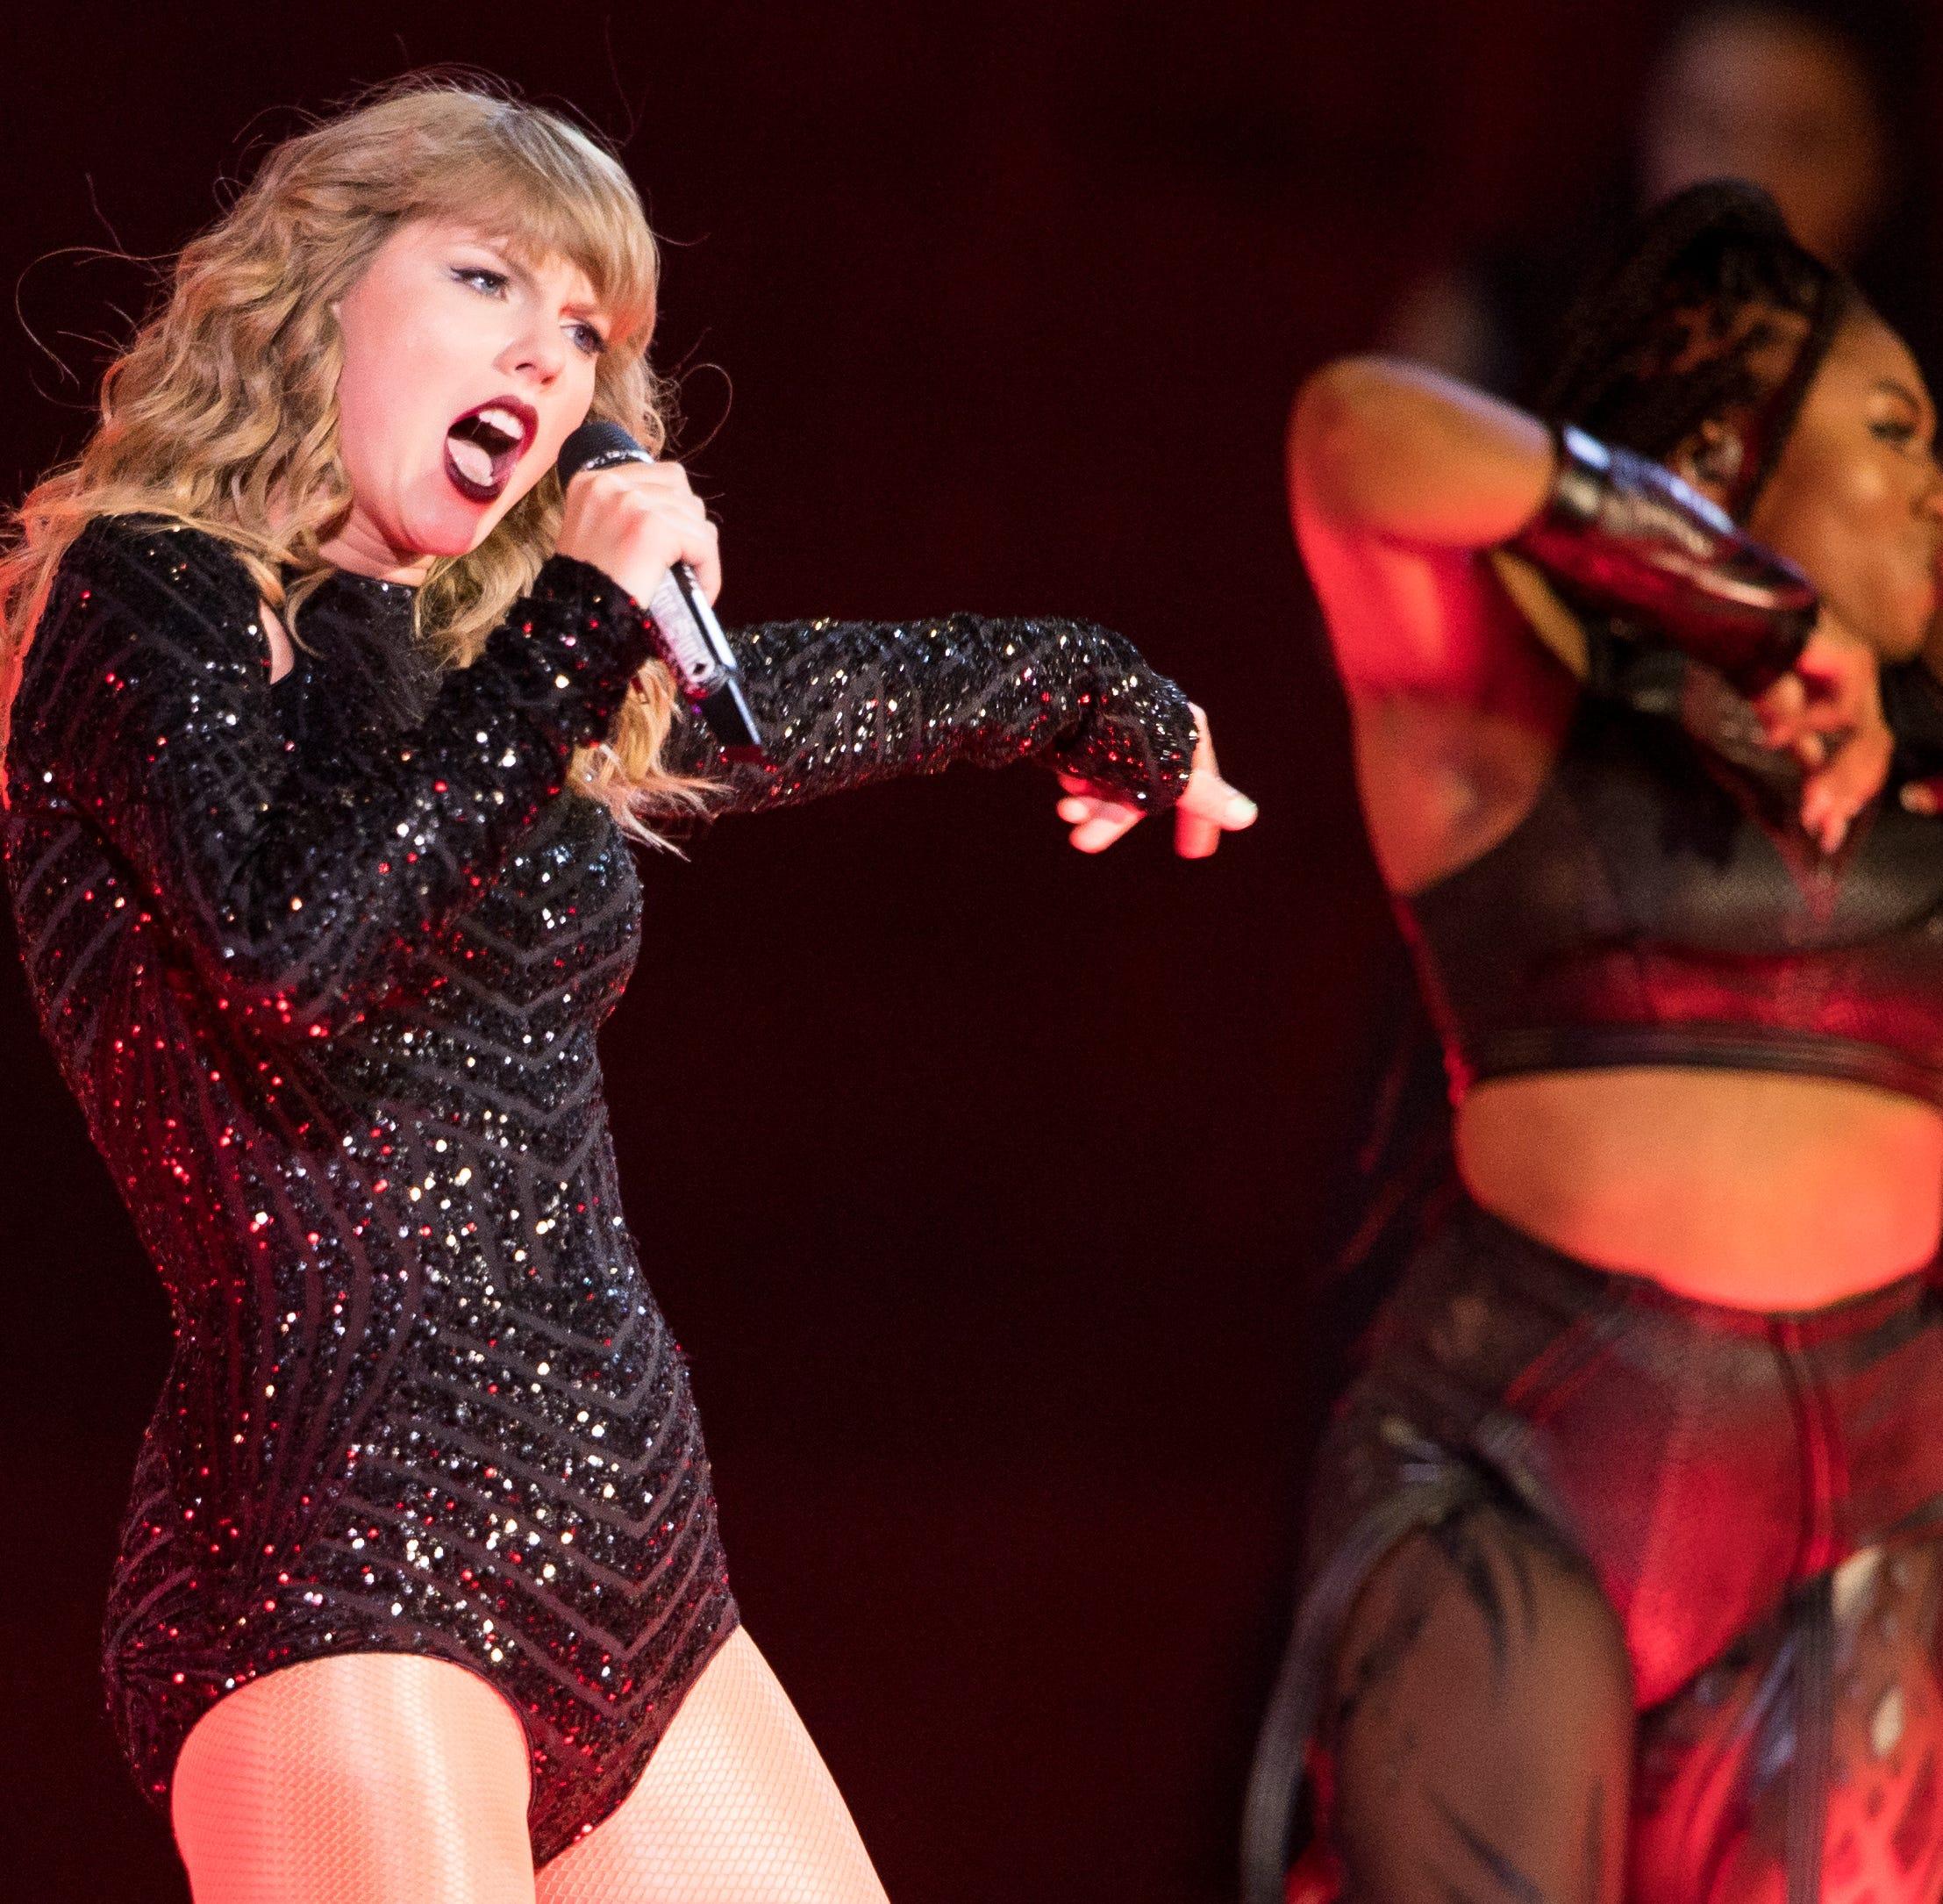 Shake it off: Taylor Swift's political endorsement draws praise, backlash